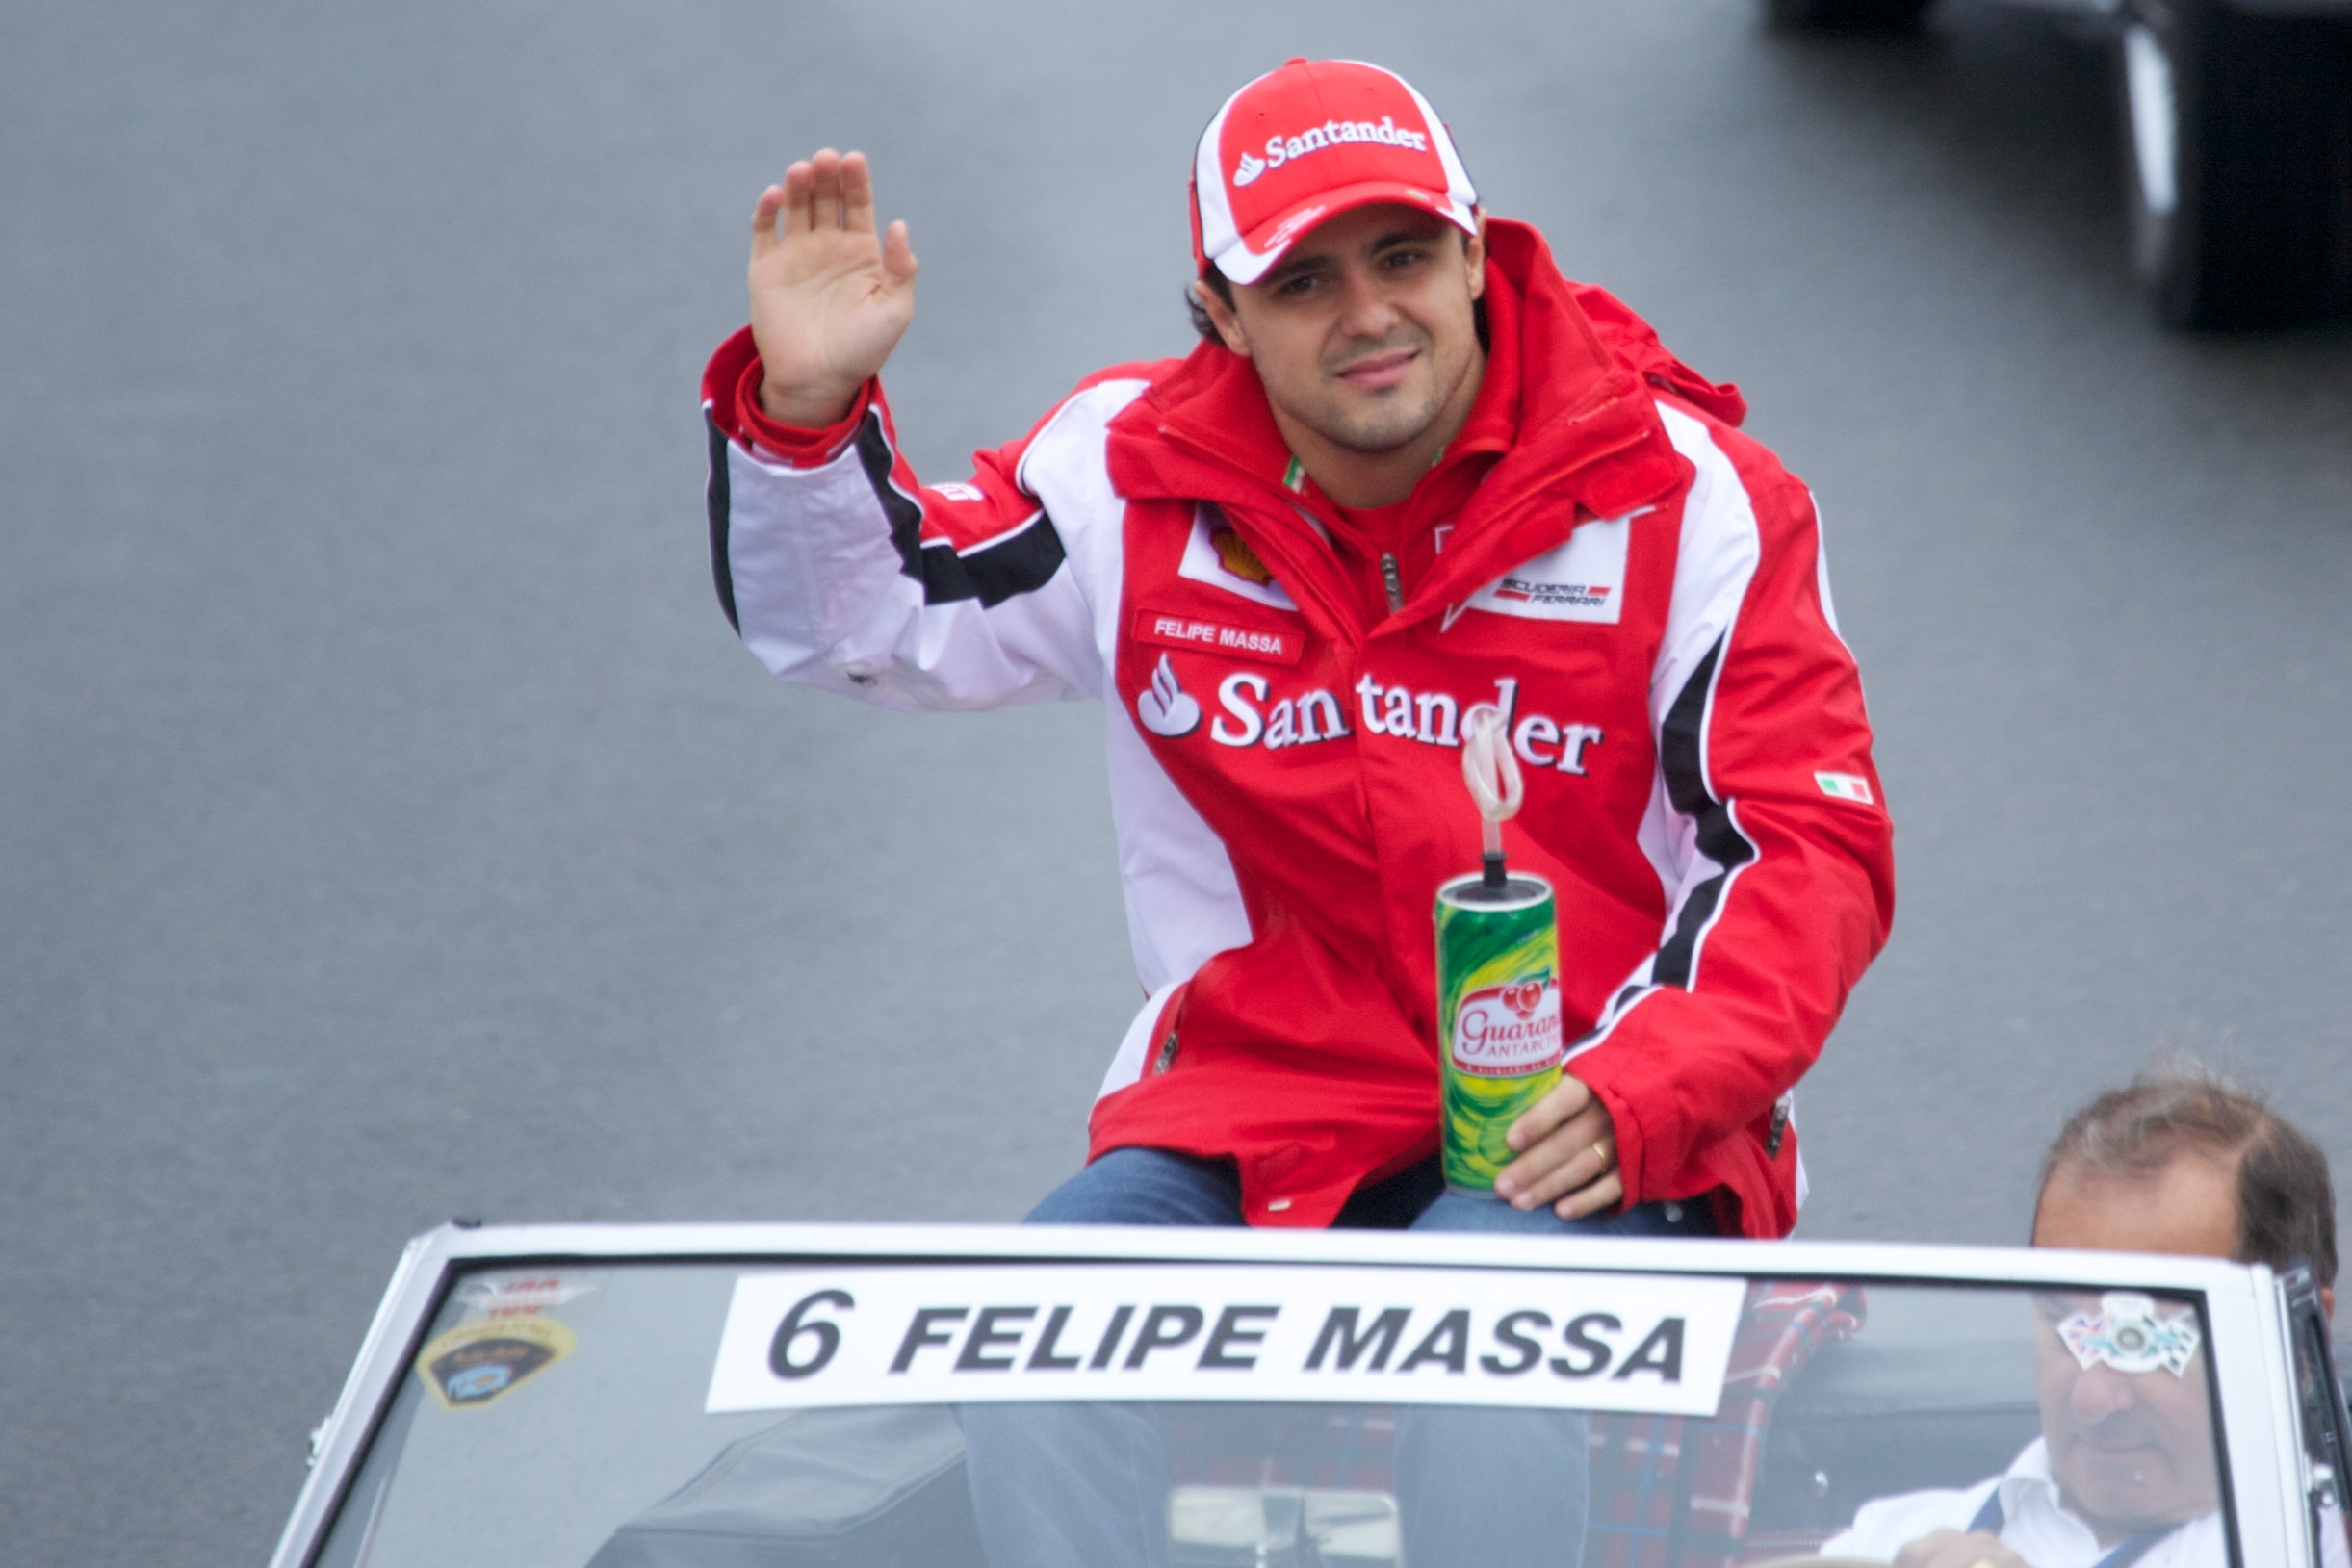 Felipe Massa Größe